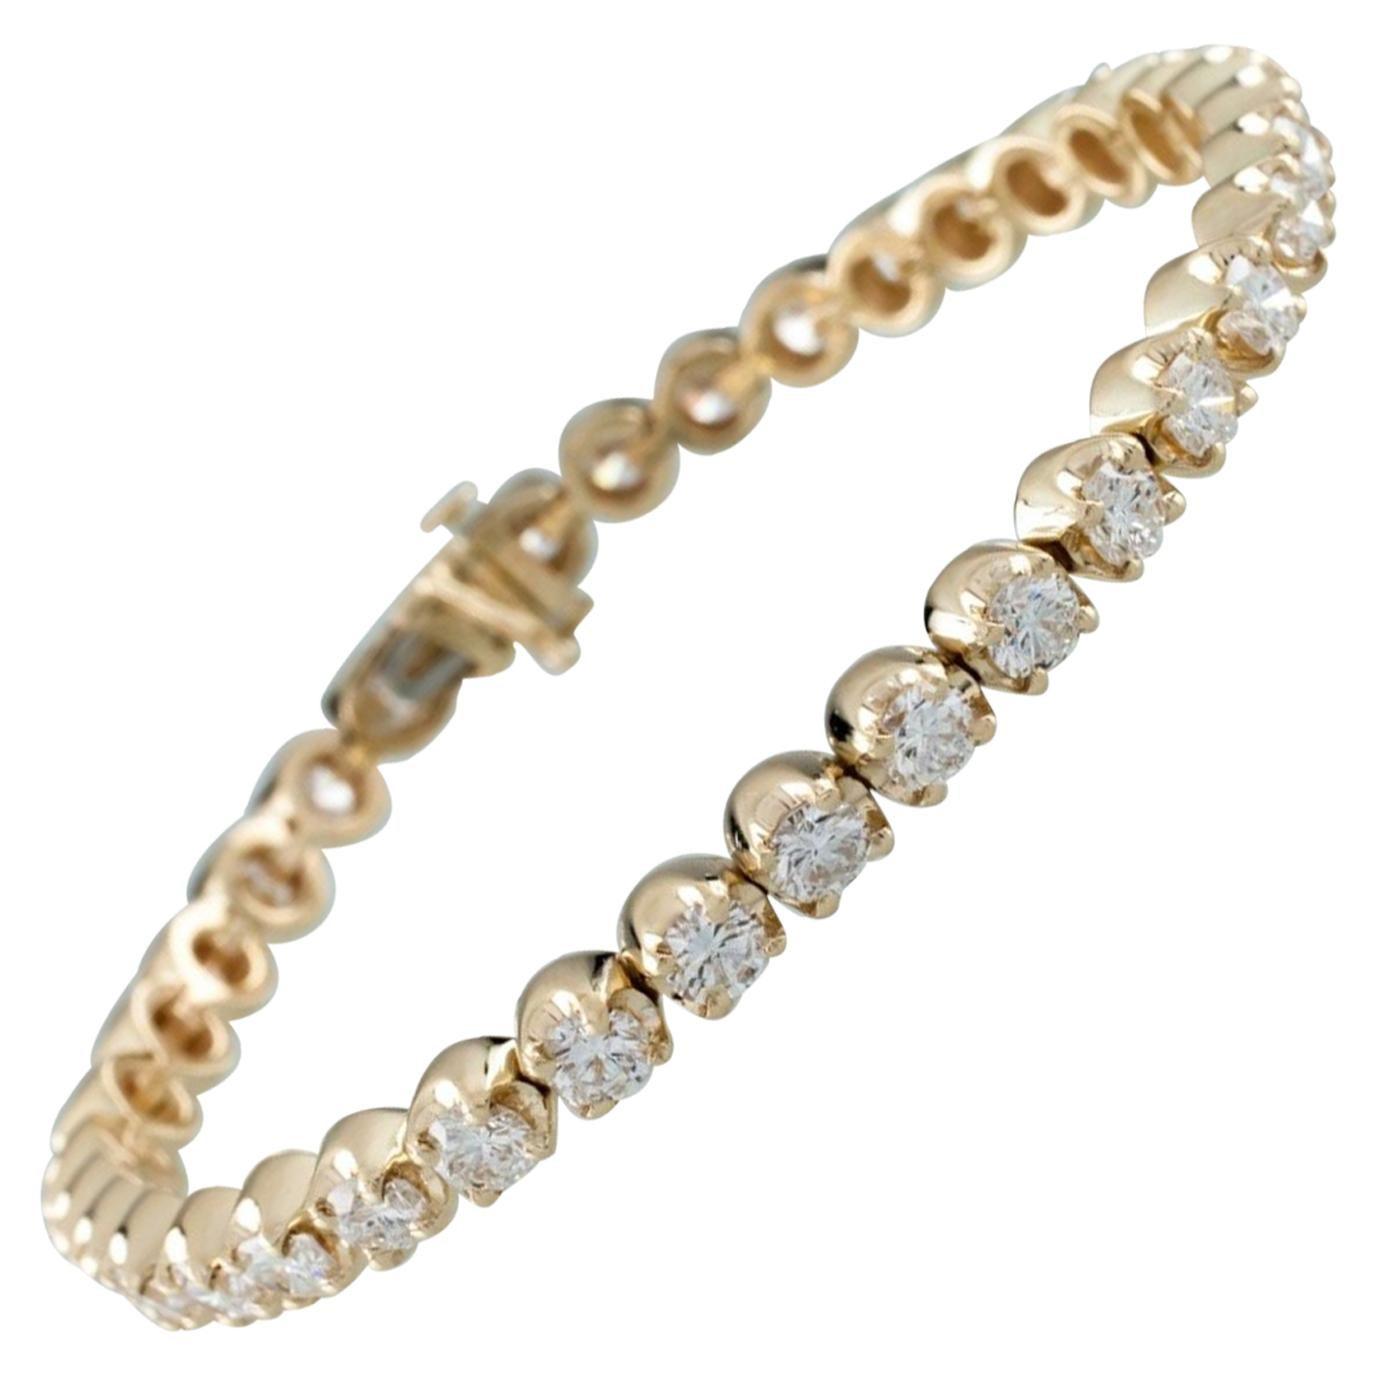 6.00 Carat Round Diamond 14 Karat Yellow Gold Tennis Bracelet